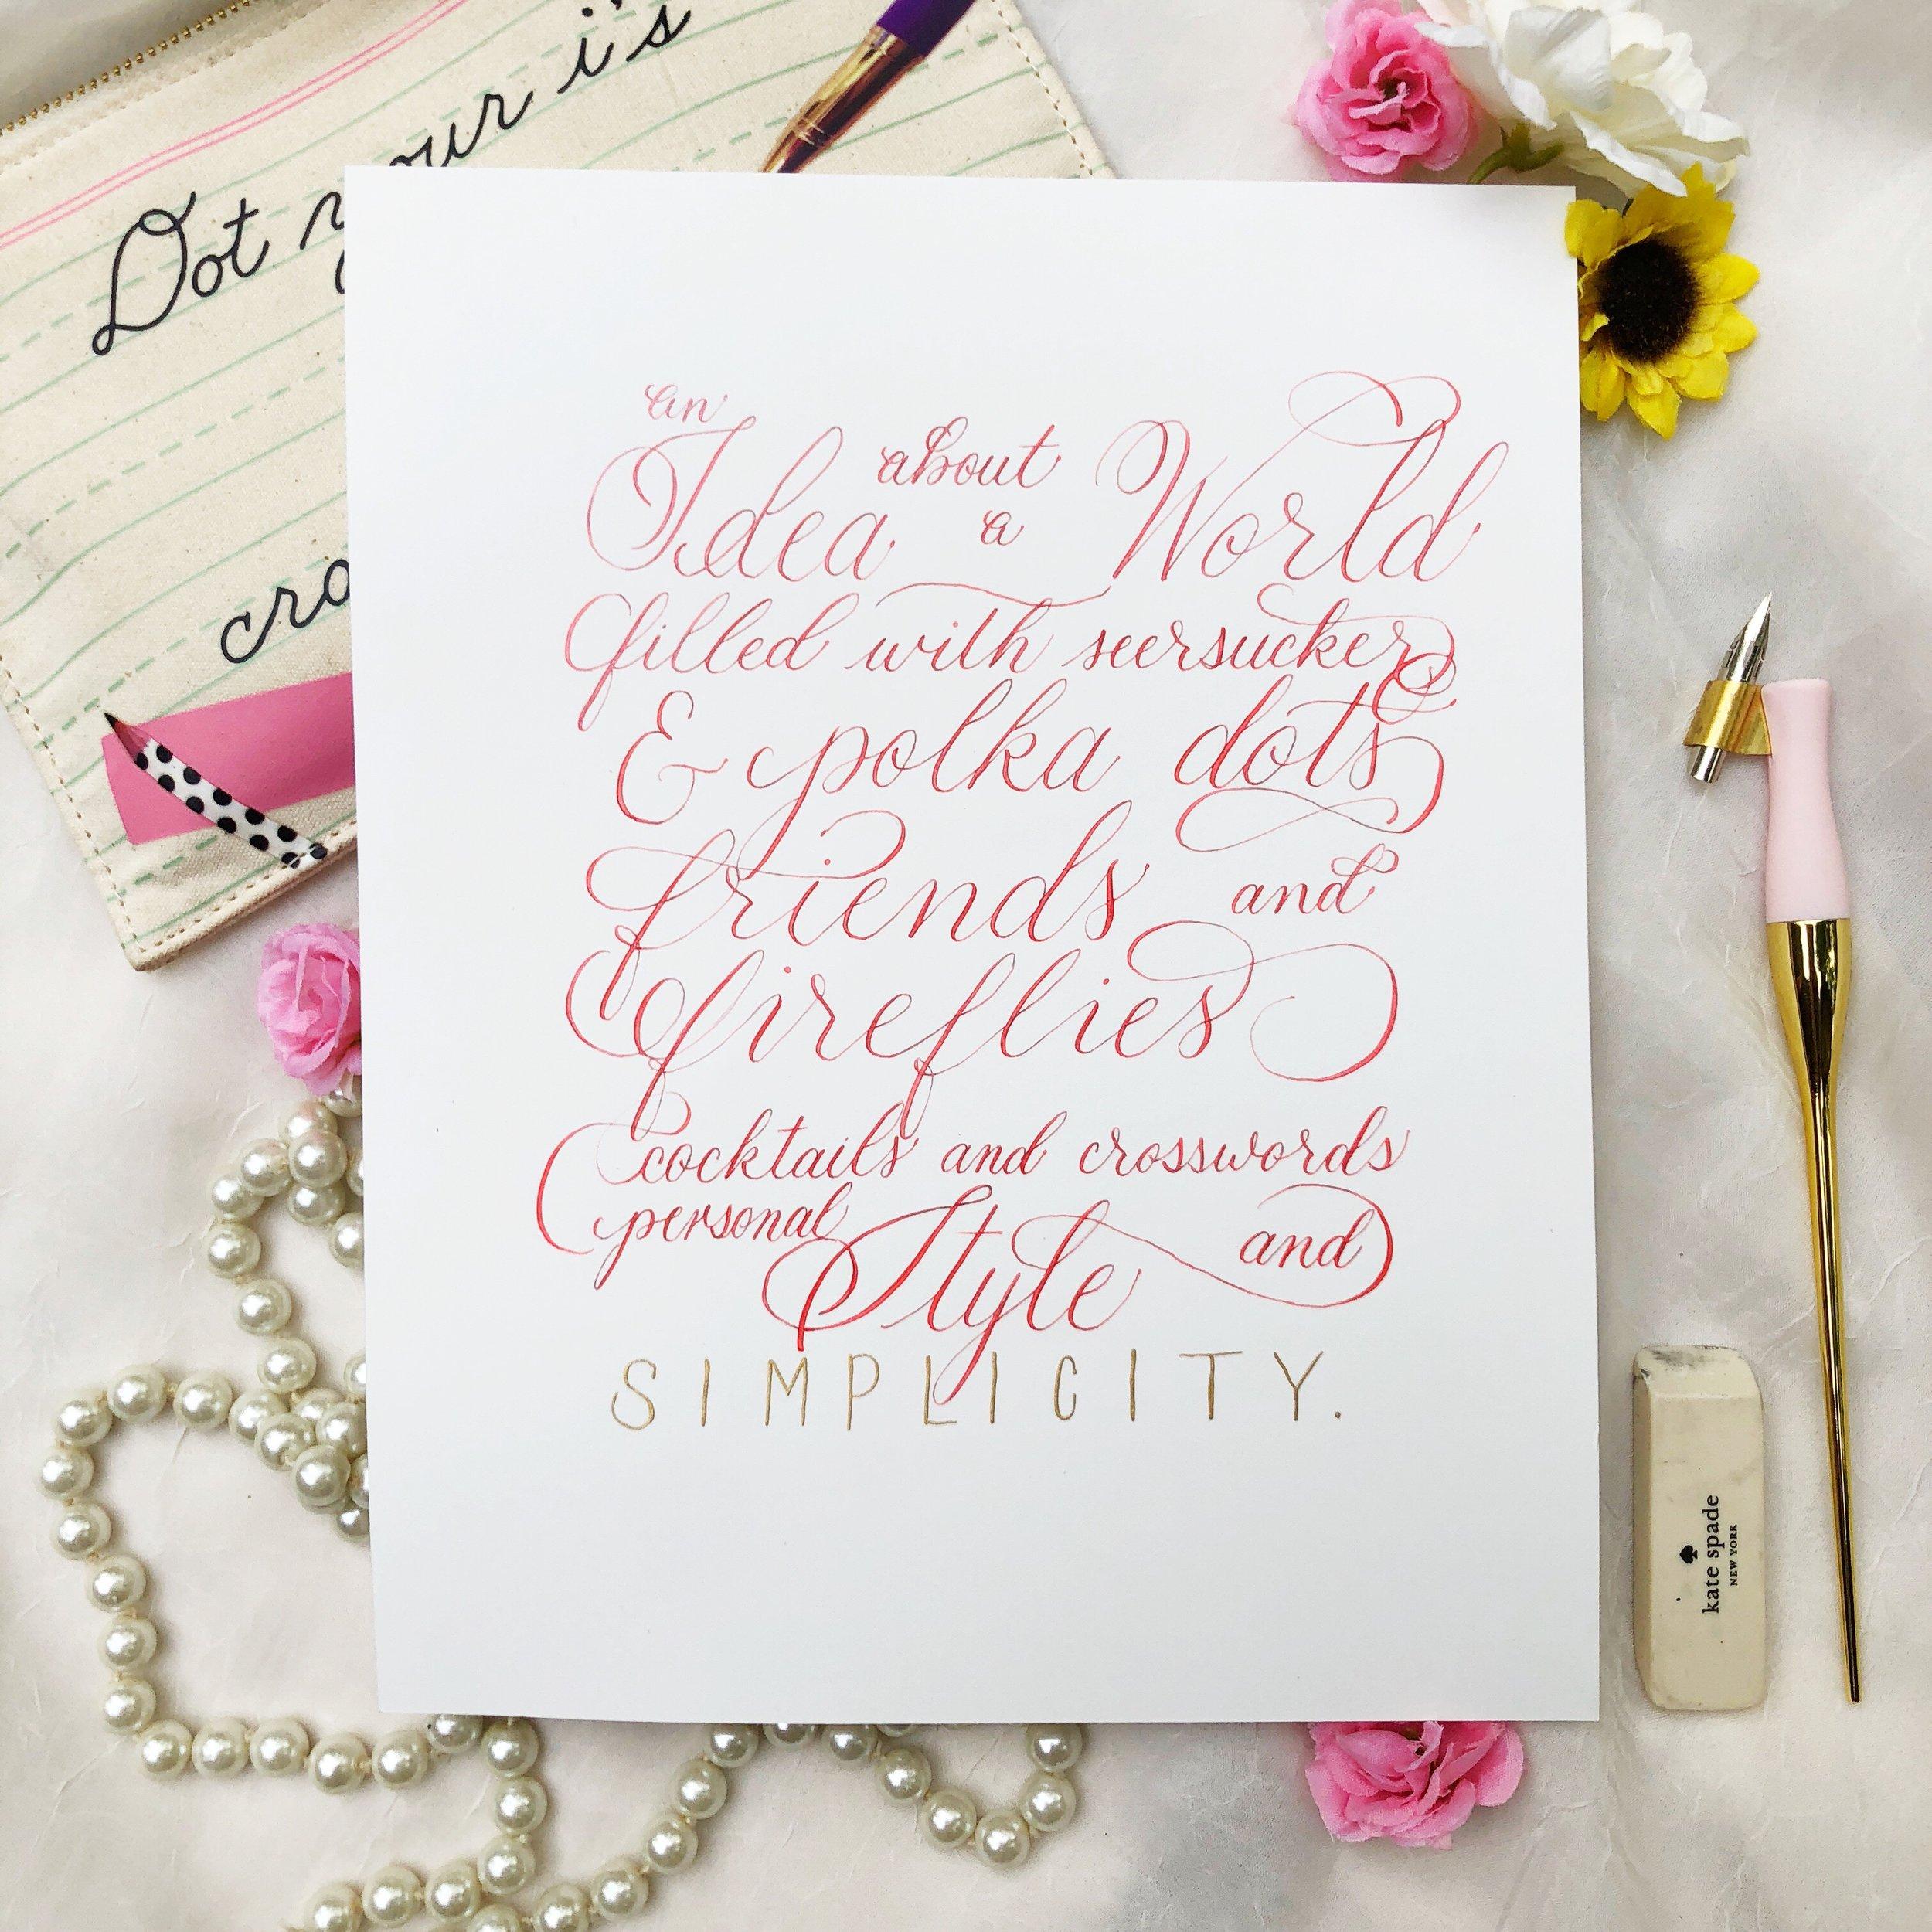 Central PA, York PA, JesSmith Designs, custom, wedding, invitations, bridal, Harrisburg, hanover, calligraphy, baltimore, wedding invitations, lancaster, gettysburg, 06-09 06.47.58.jpg